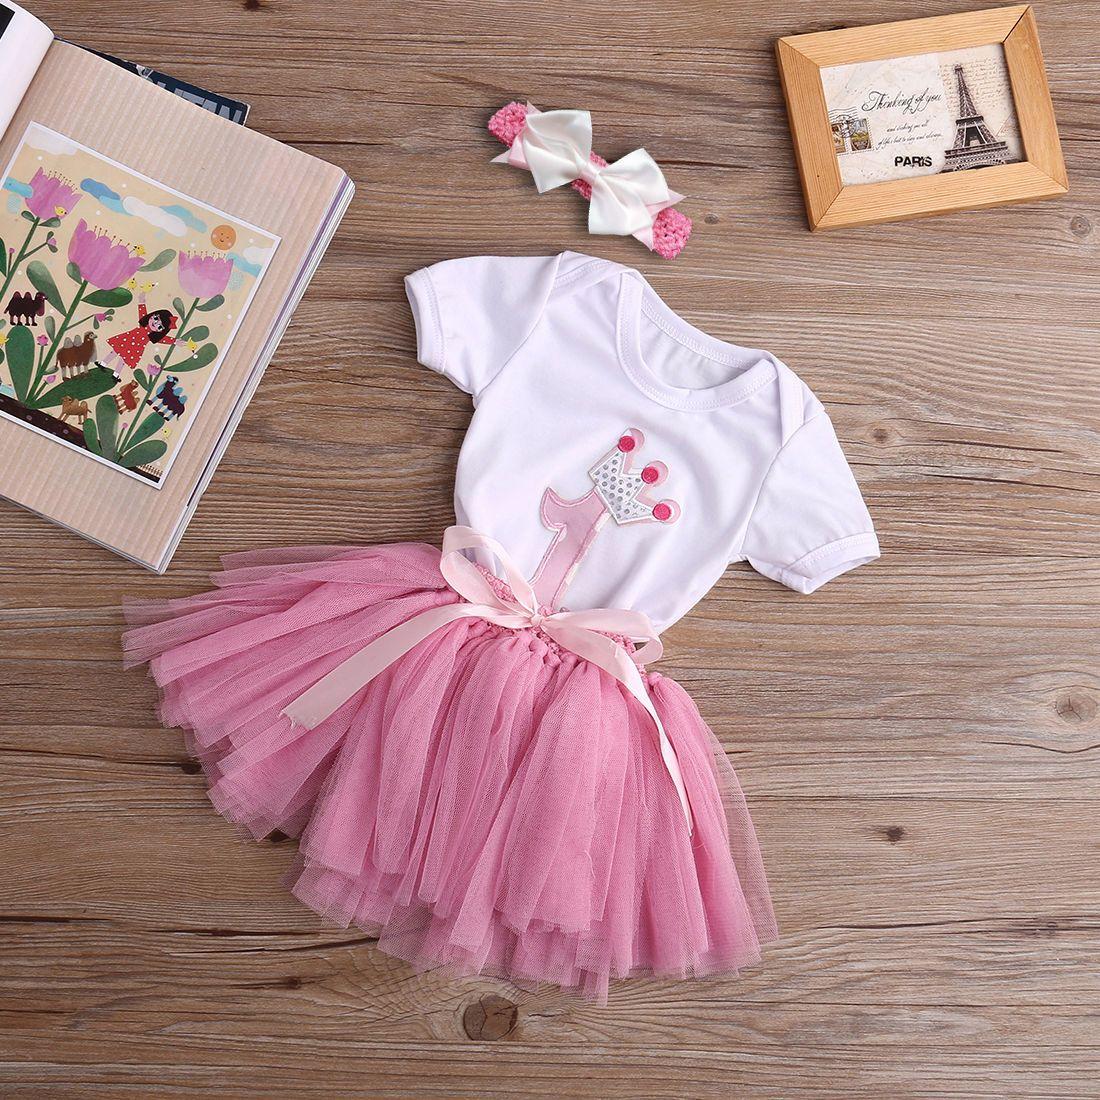 Großhandel Großhandels Baby Girl Stirnband 1. Geburtstag Outfit ...